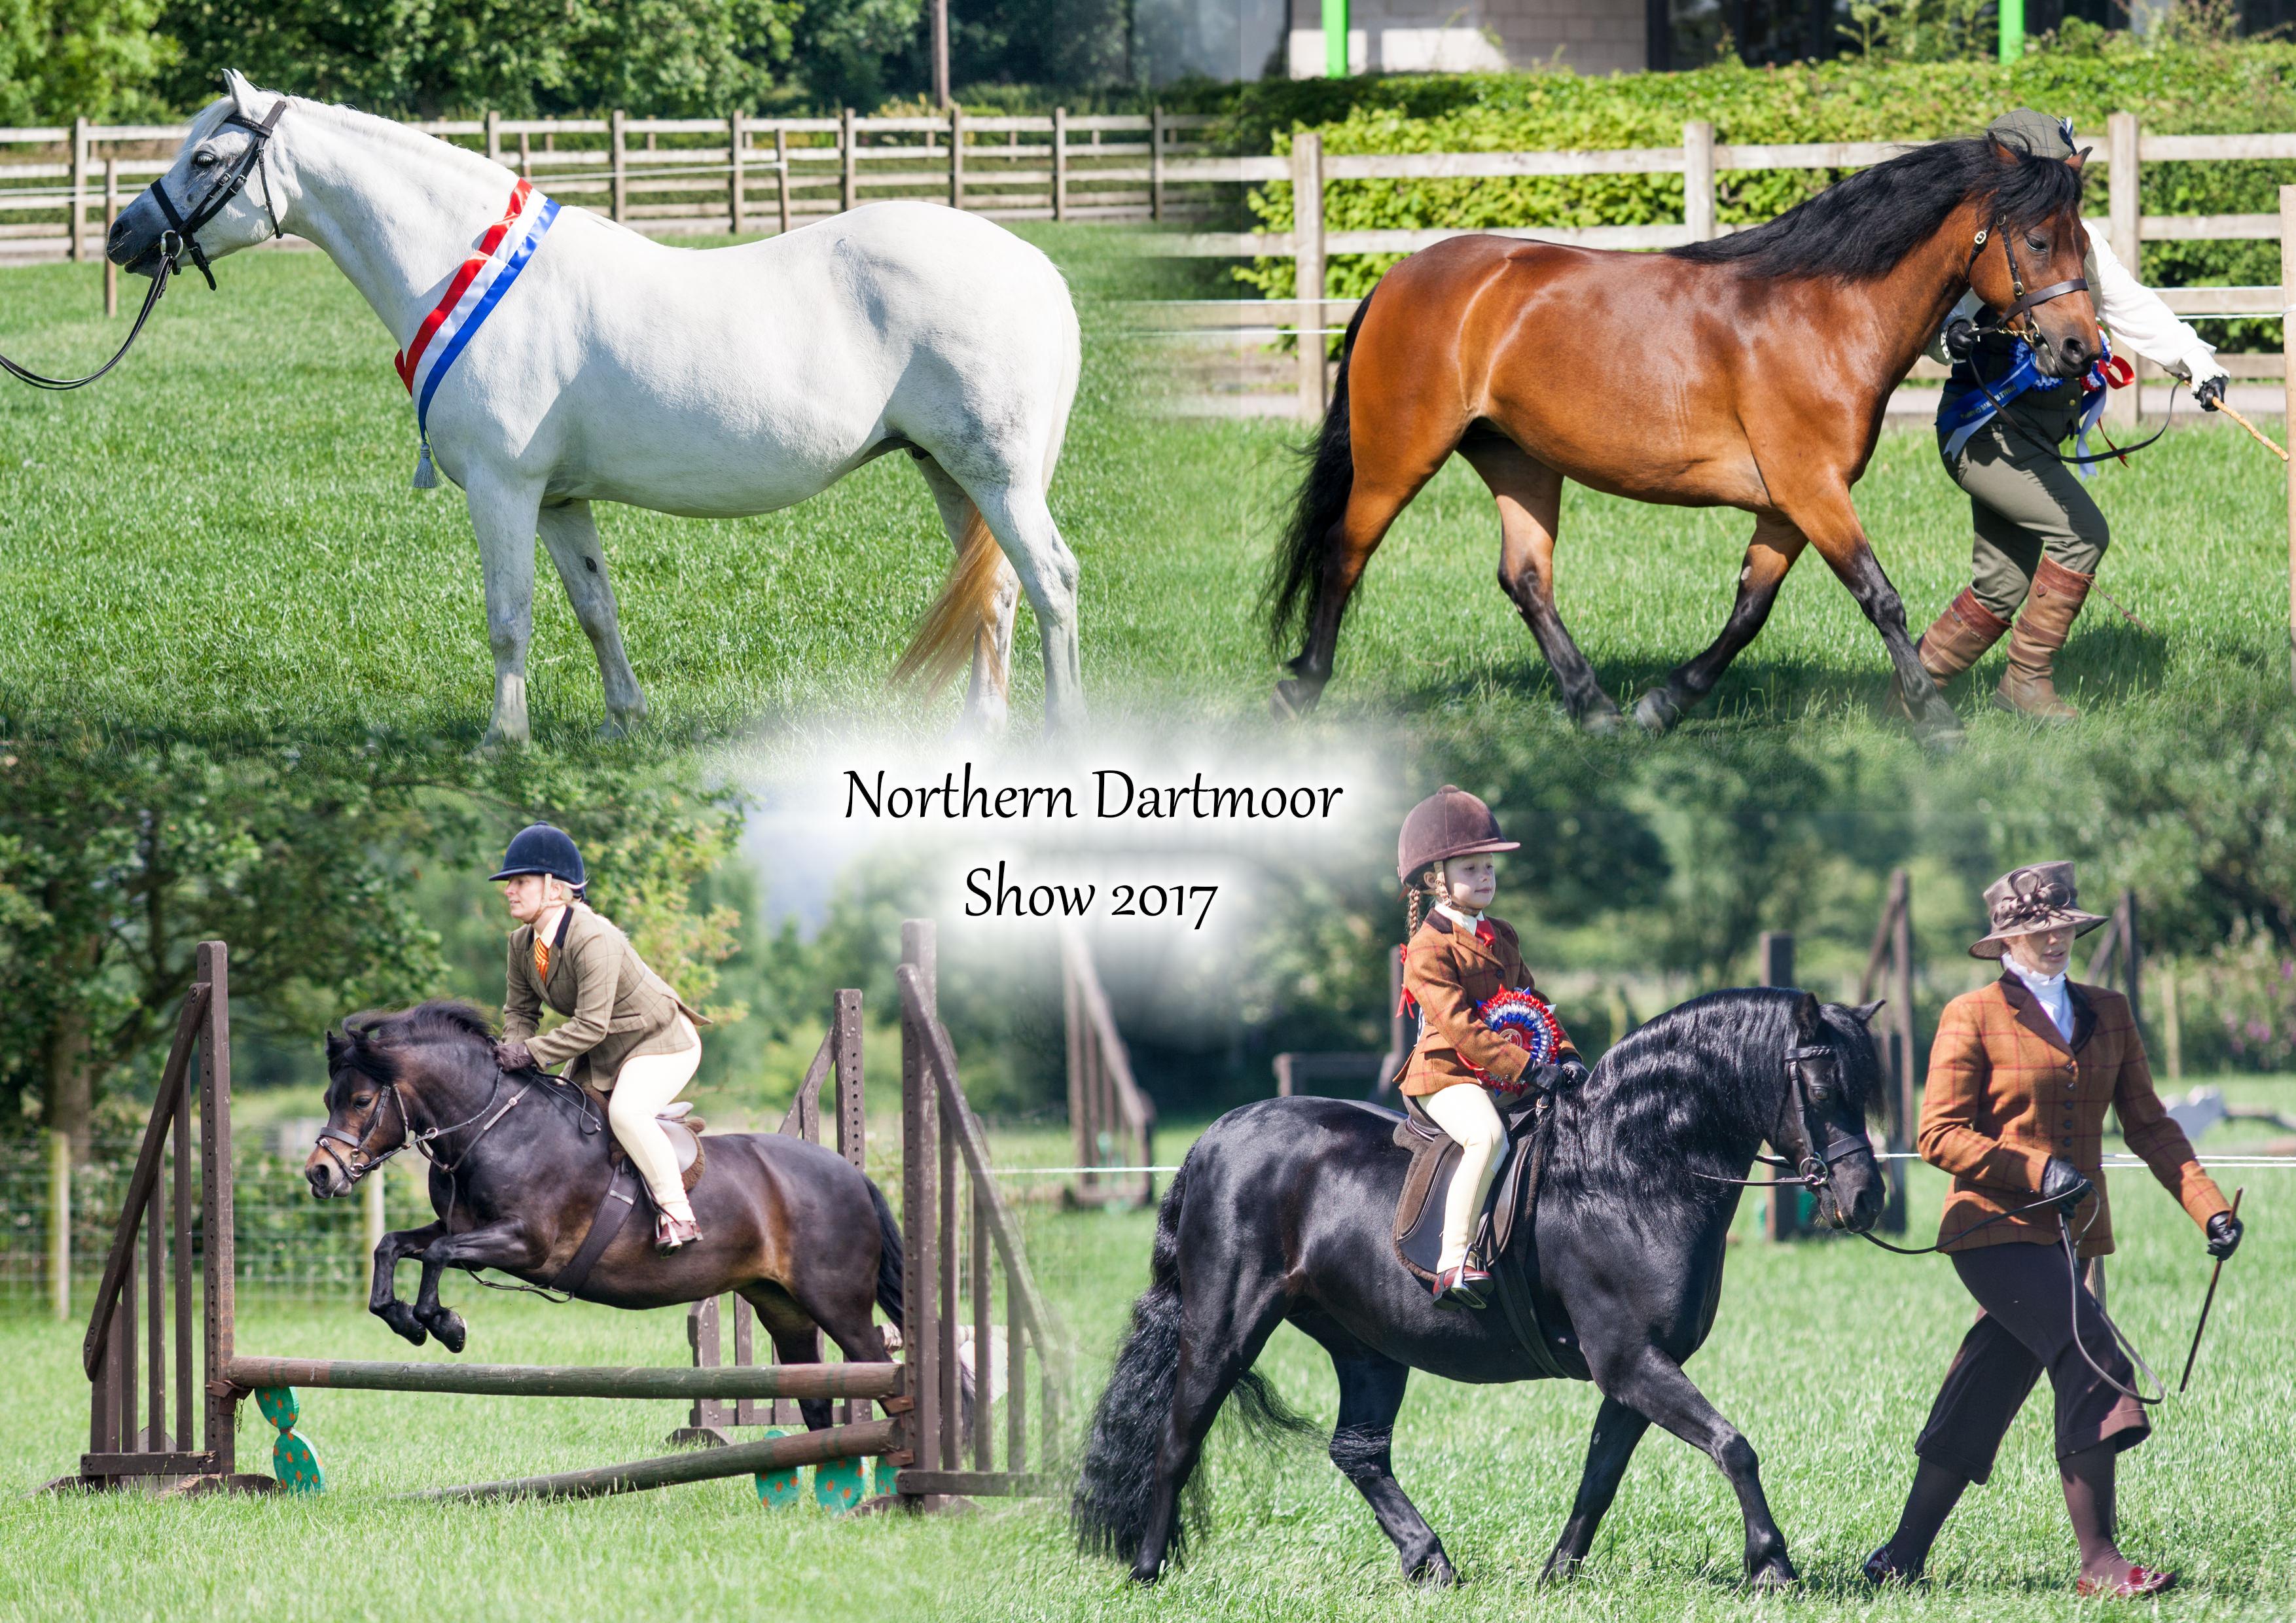 The Northern Dartmoor Pony Show